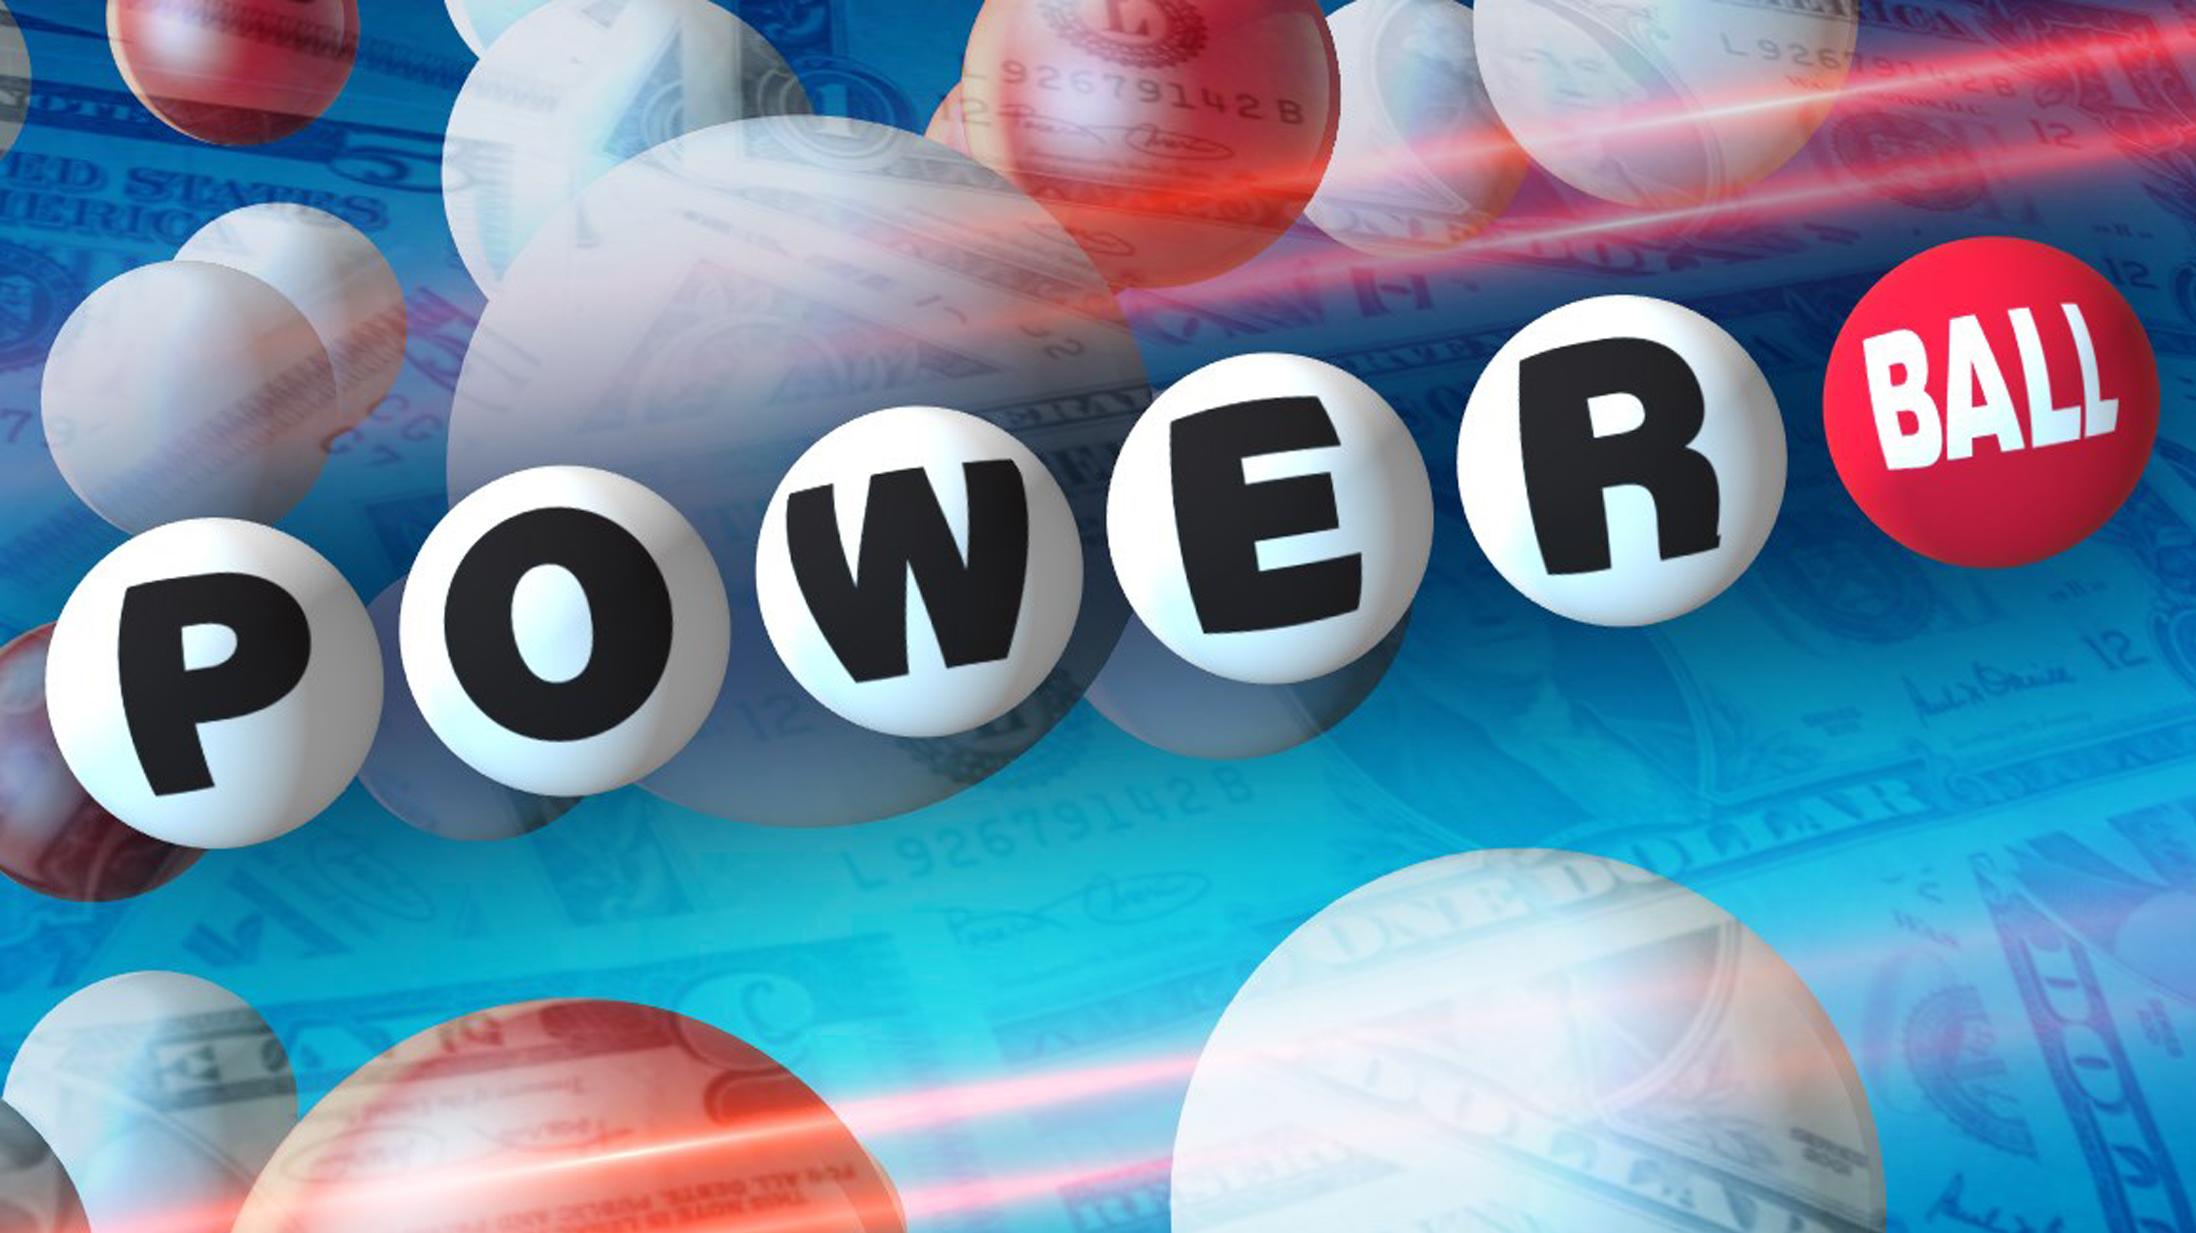 Powerball 01052015_1452123430037.jpg